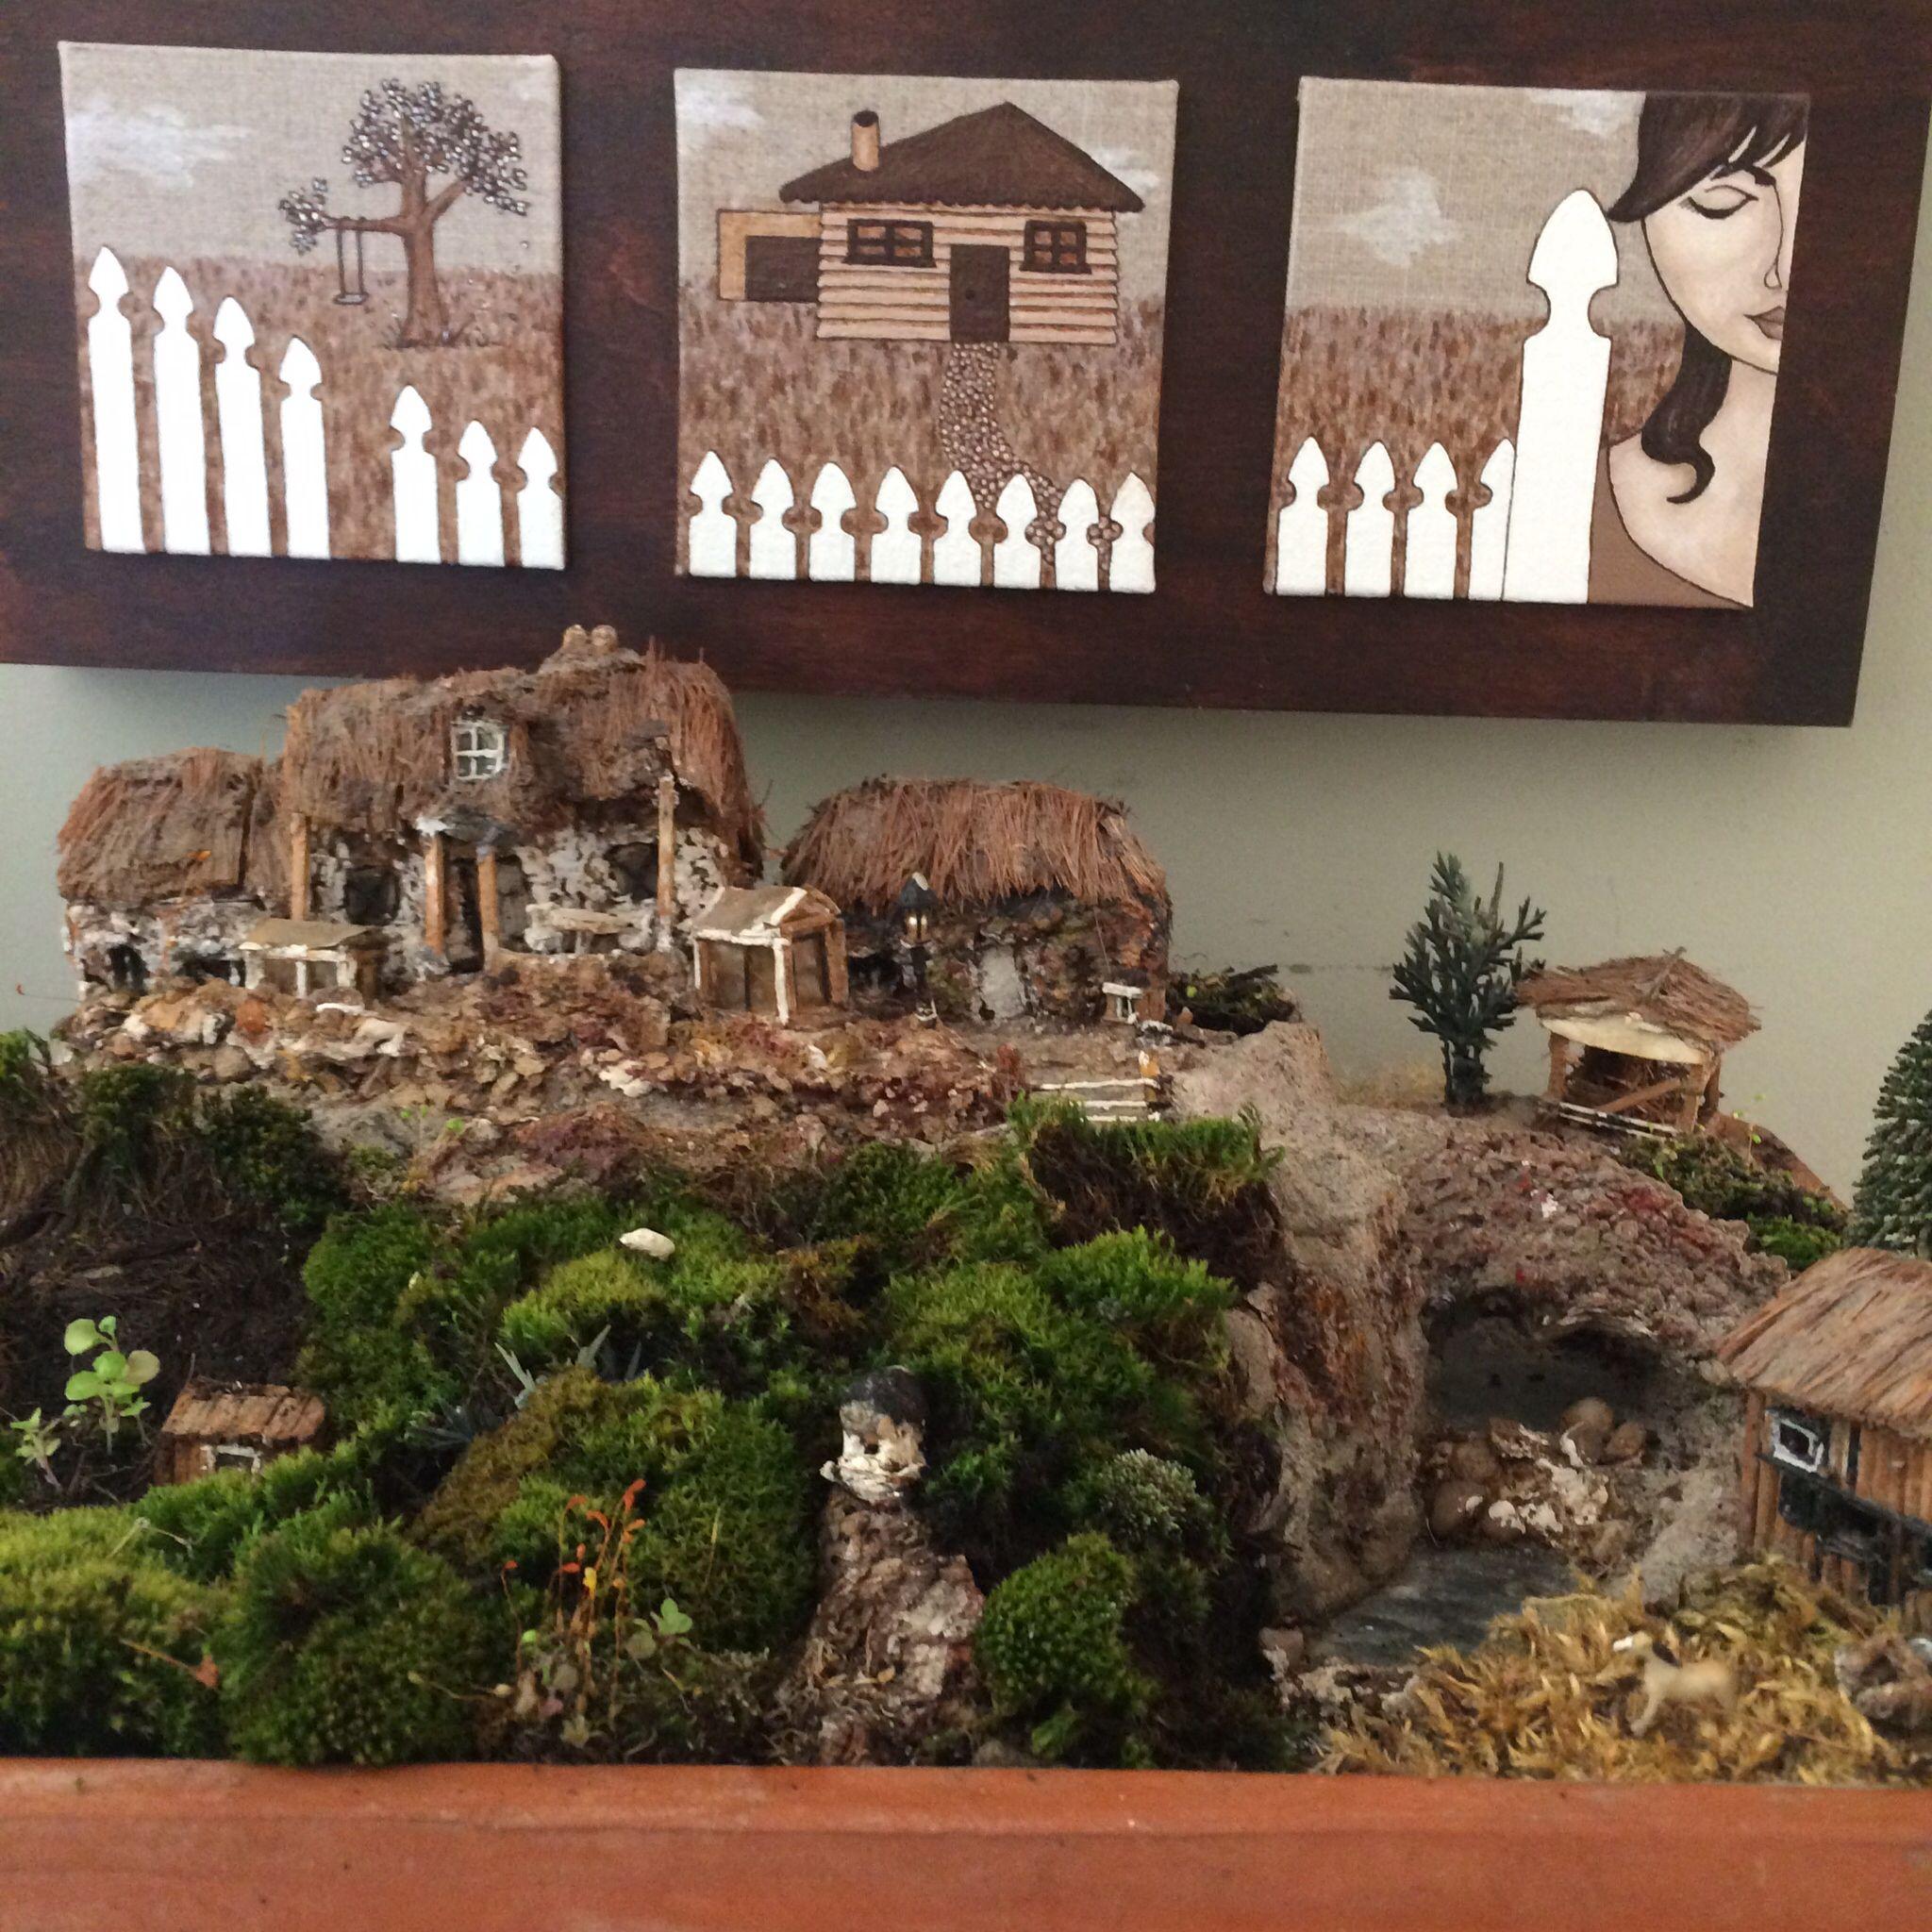 Miniature farm